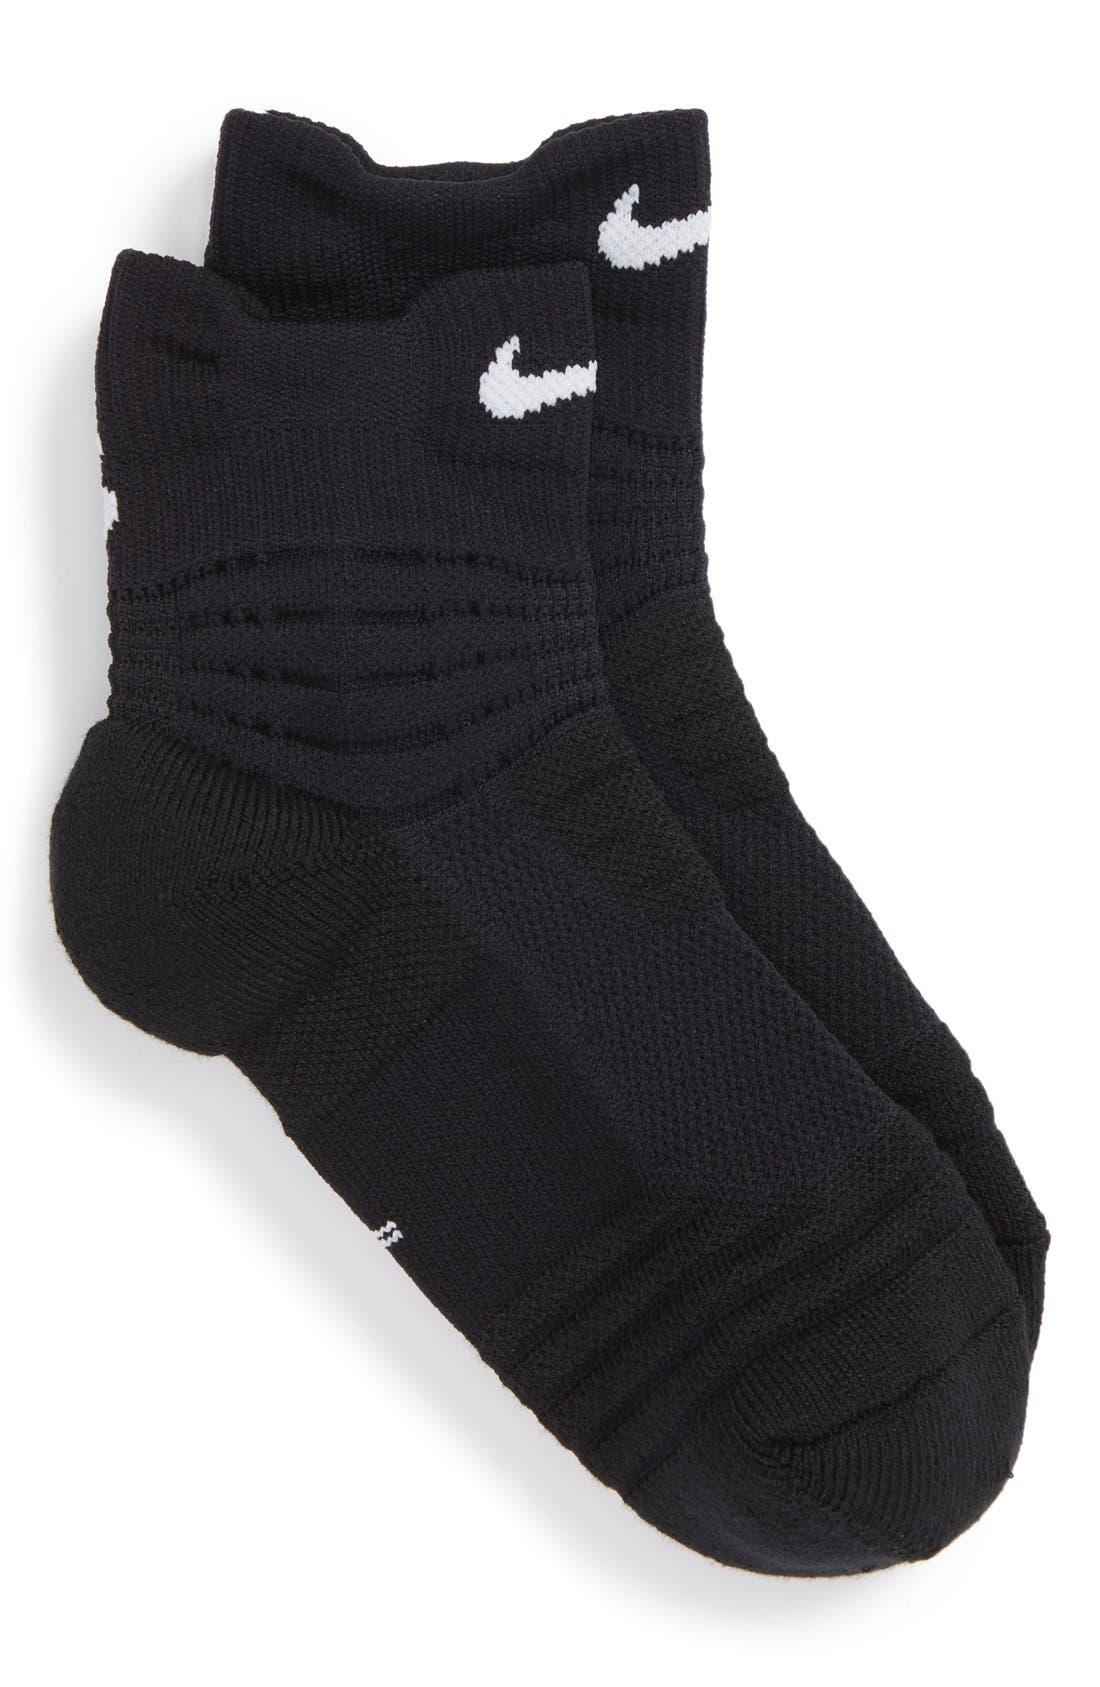 Nike 'Elite Basketball' Dri-FIT Cushioned Quarter Socks (Toddler, Little Kid & Big Kid)